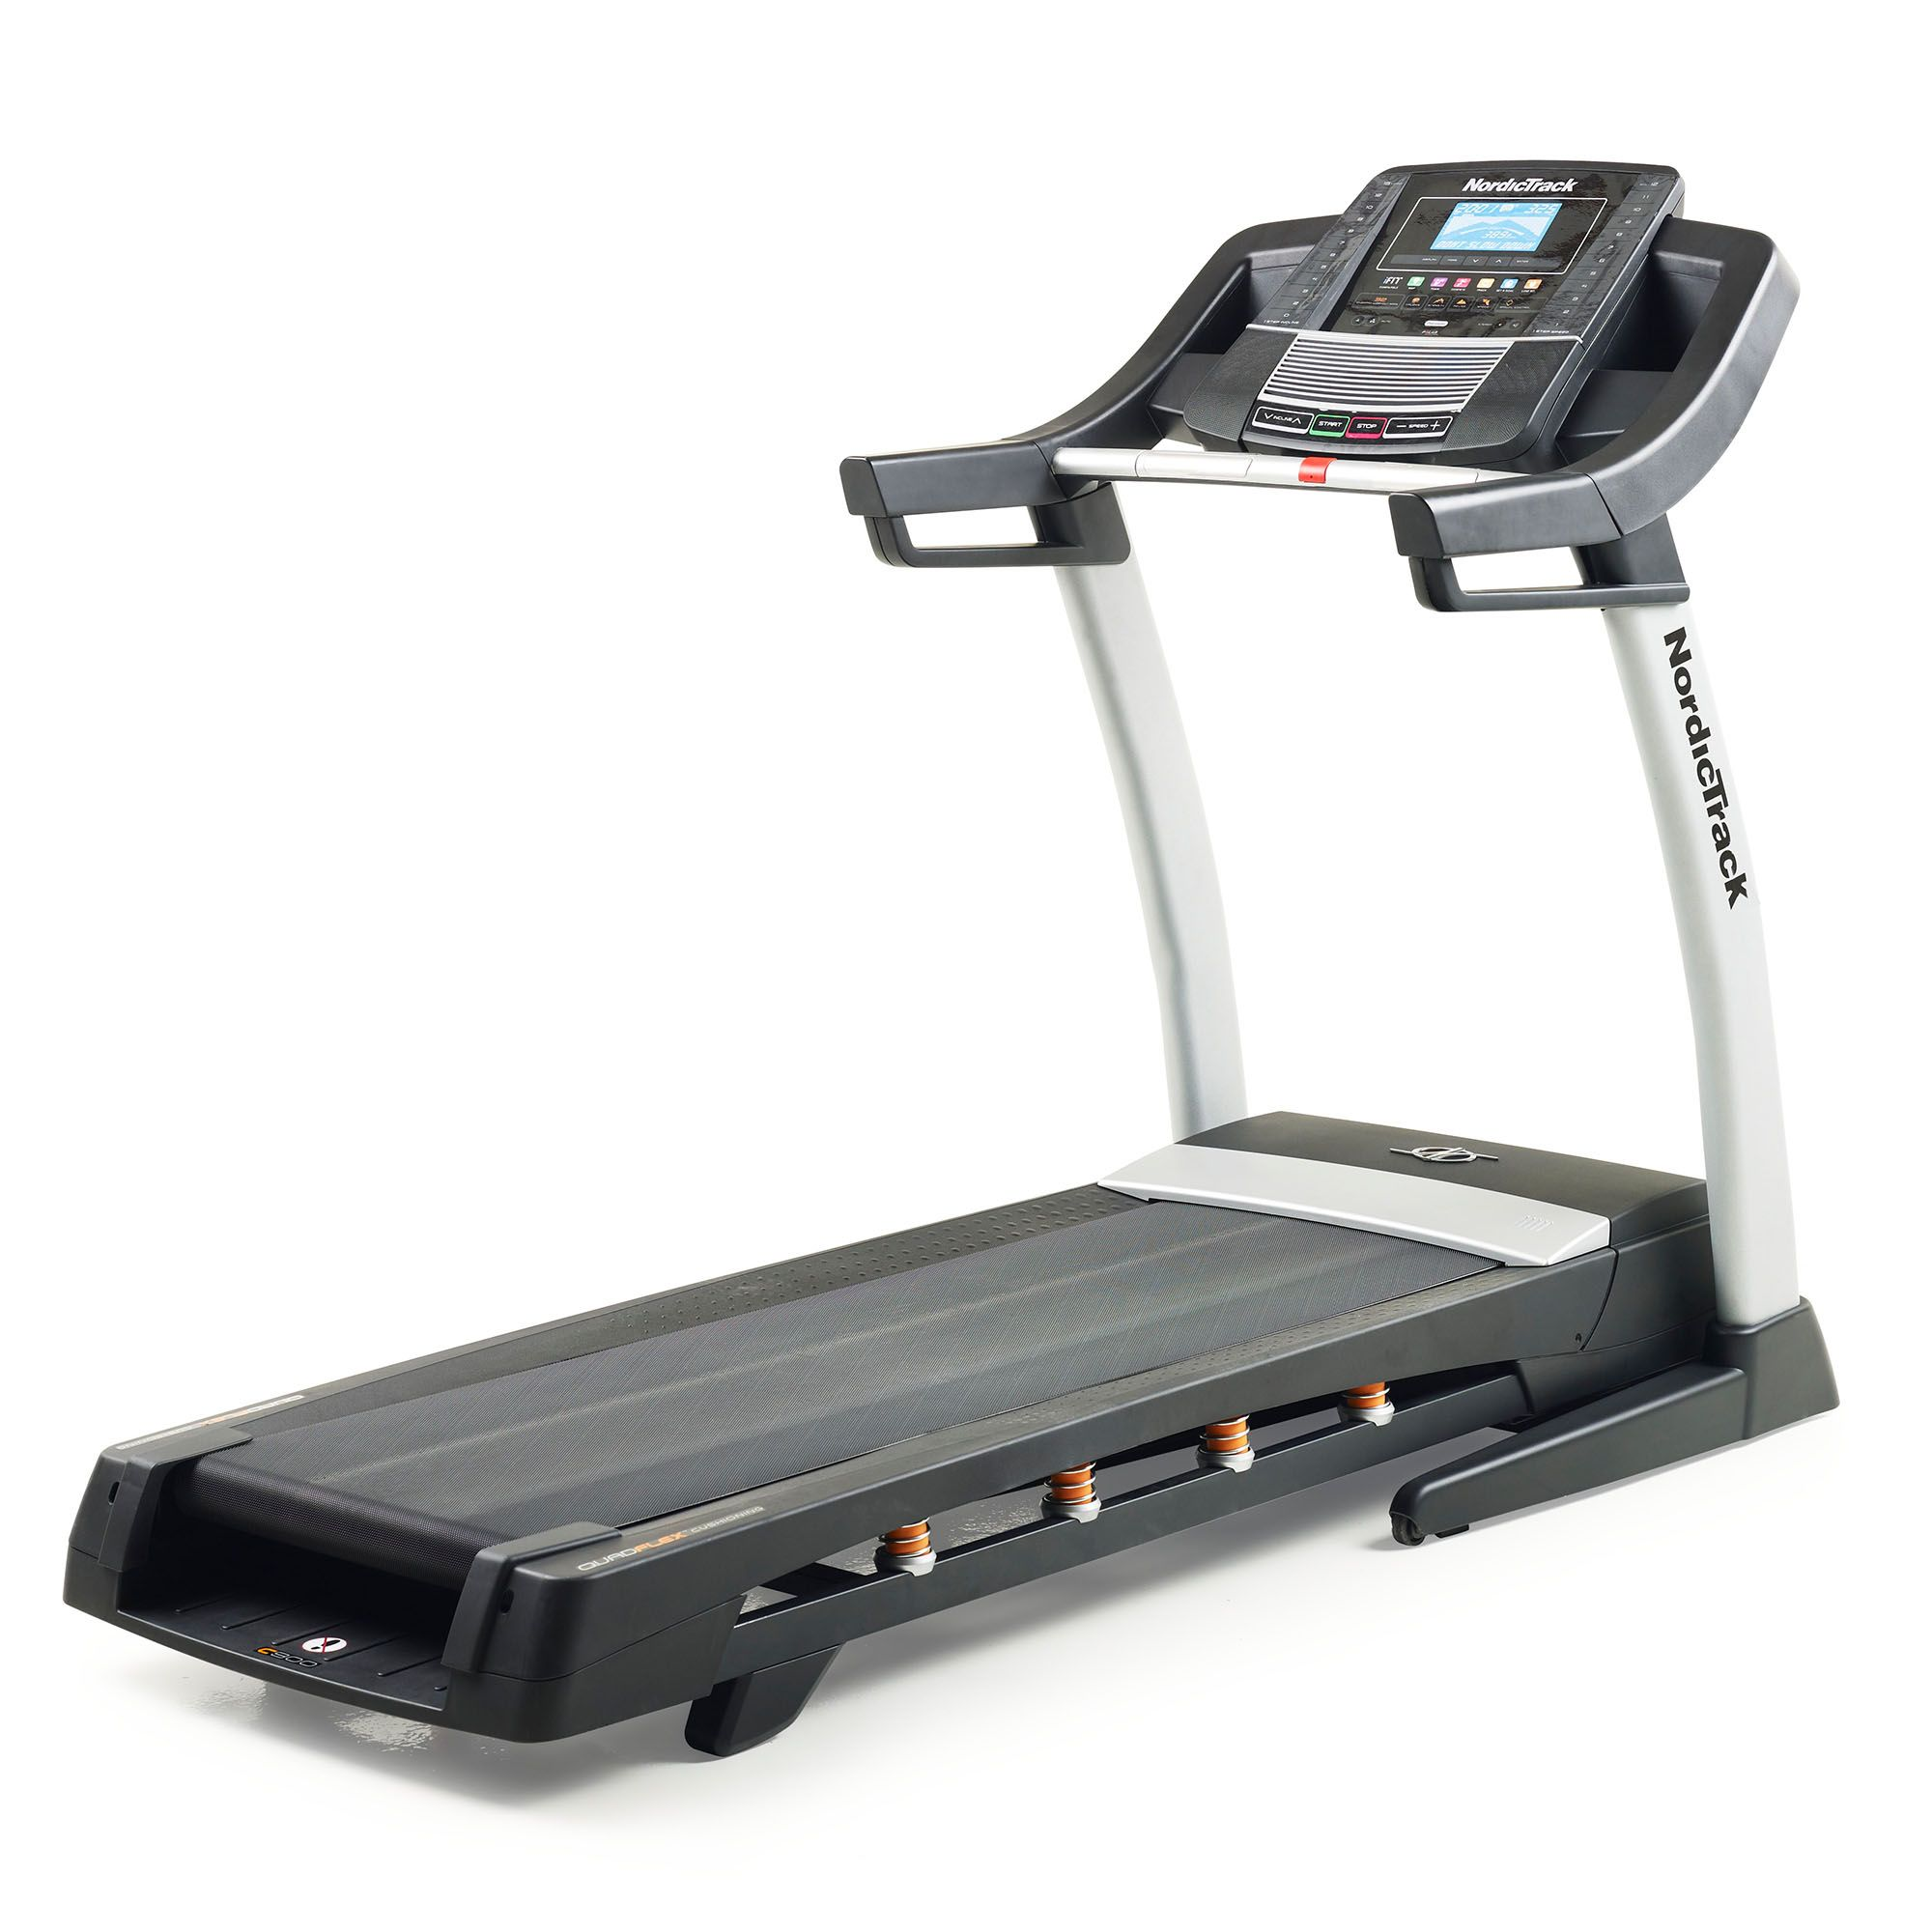 Treadmill: Nordictrack Treadmill Manual